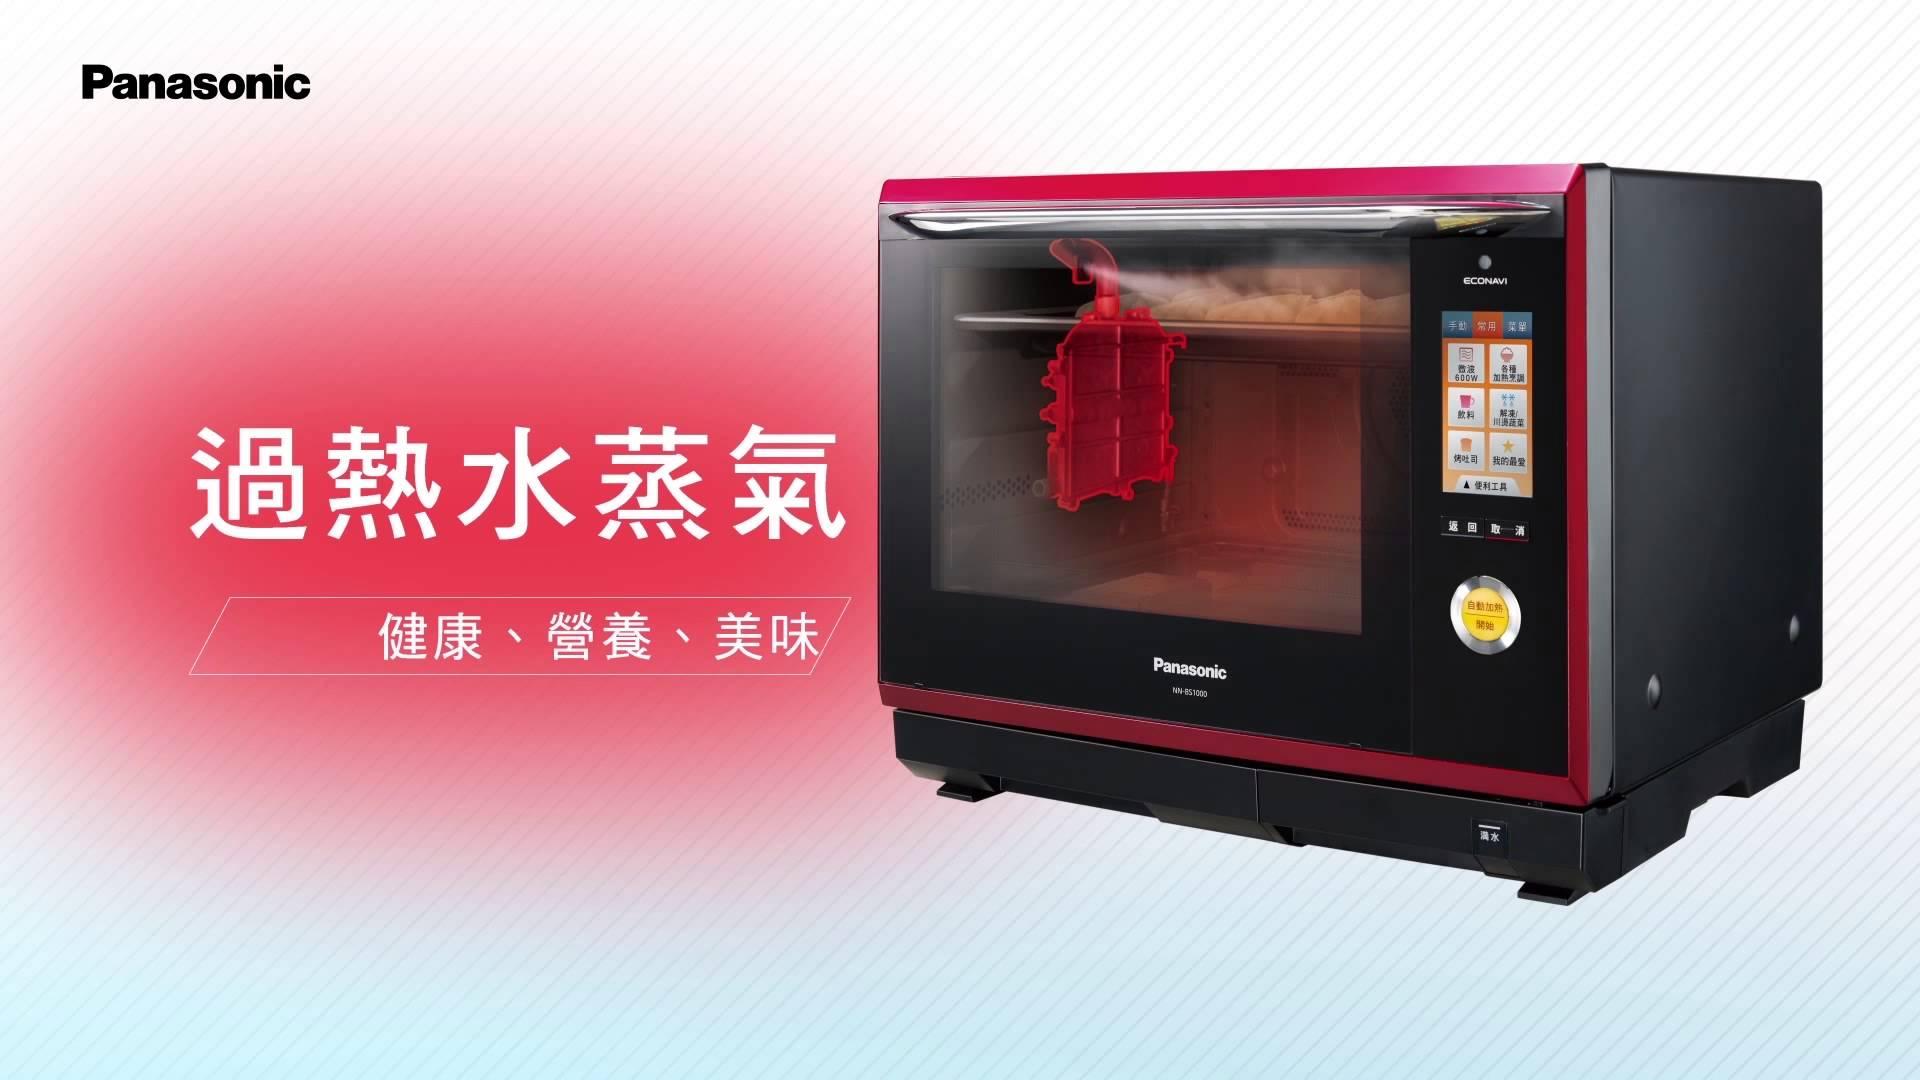 Panasonic 32L蒸氣烘烤微波爐NN-BS1000